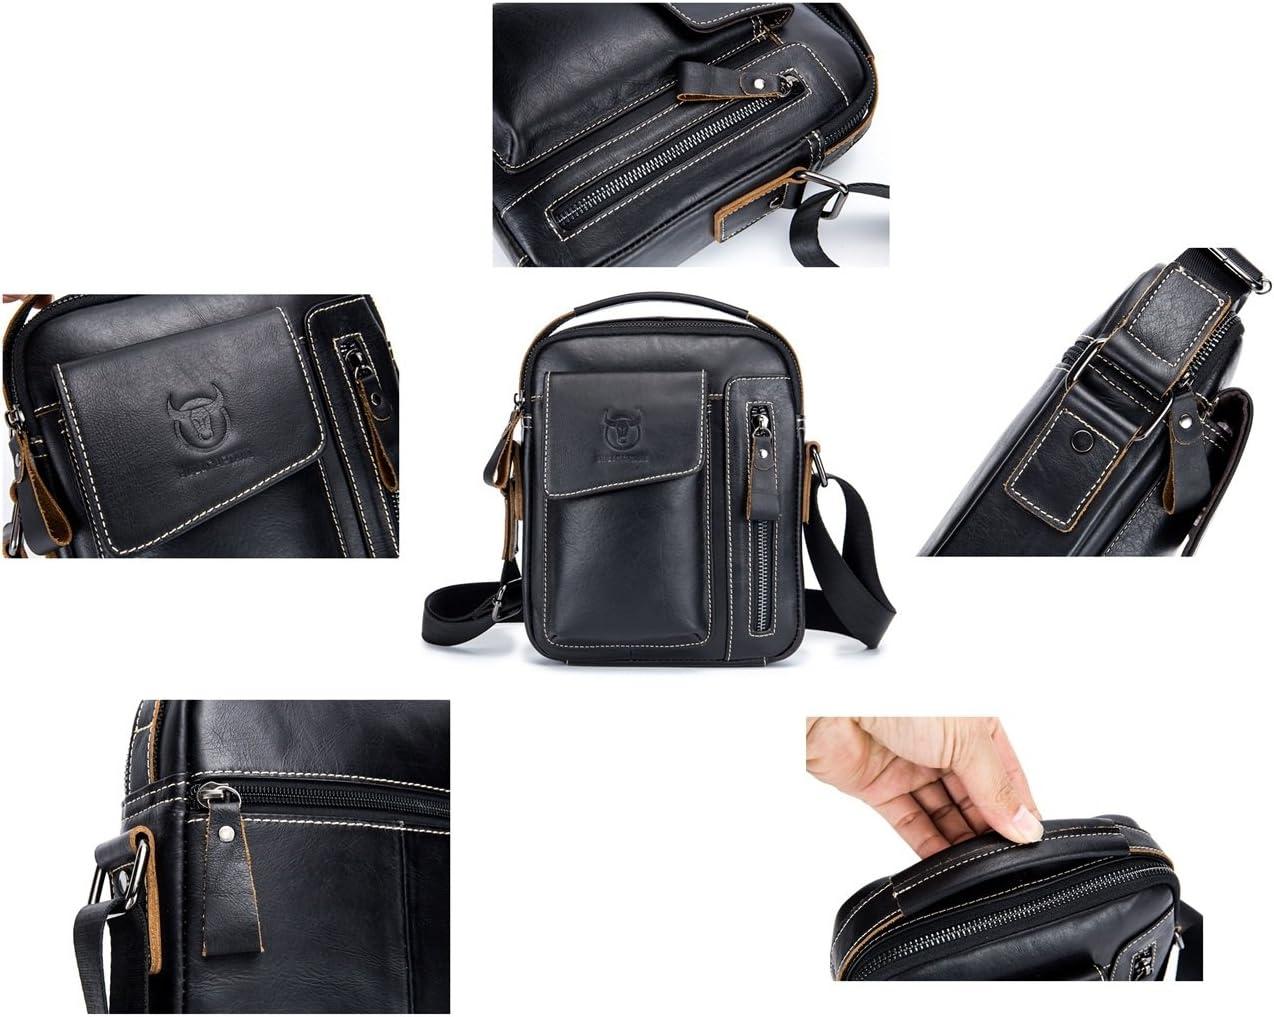 Color : Coffee Color JIAYONG Chest Bag 2019 Fashion Bag Men Chest Bag Genuine Leather Waist Bag Small Crossbody Bag Multifunction Front Backpack Casual Shoulder Bag